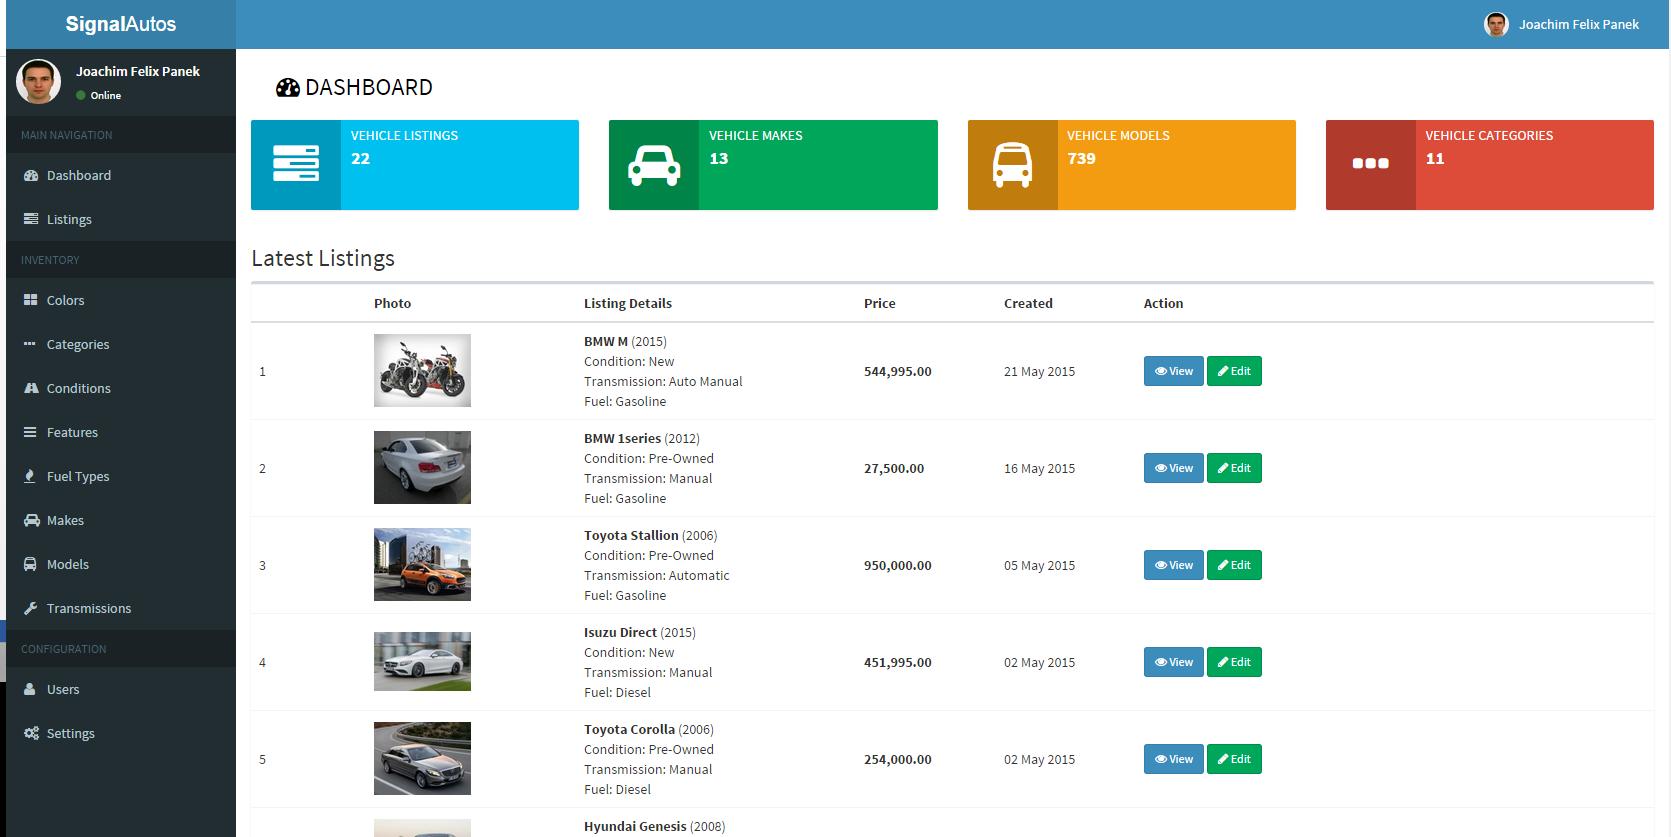 signal autos car dealership app by robisignals codecanyon. Black Bedroom Furniture Sets. Home Design Ideas